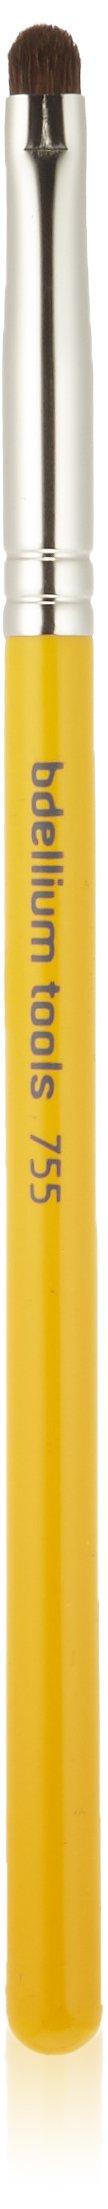 Bdellium Tools Professional Makeup Brush Studio Line - Smudge Blending Eye 755